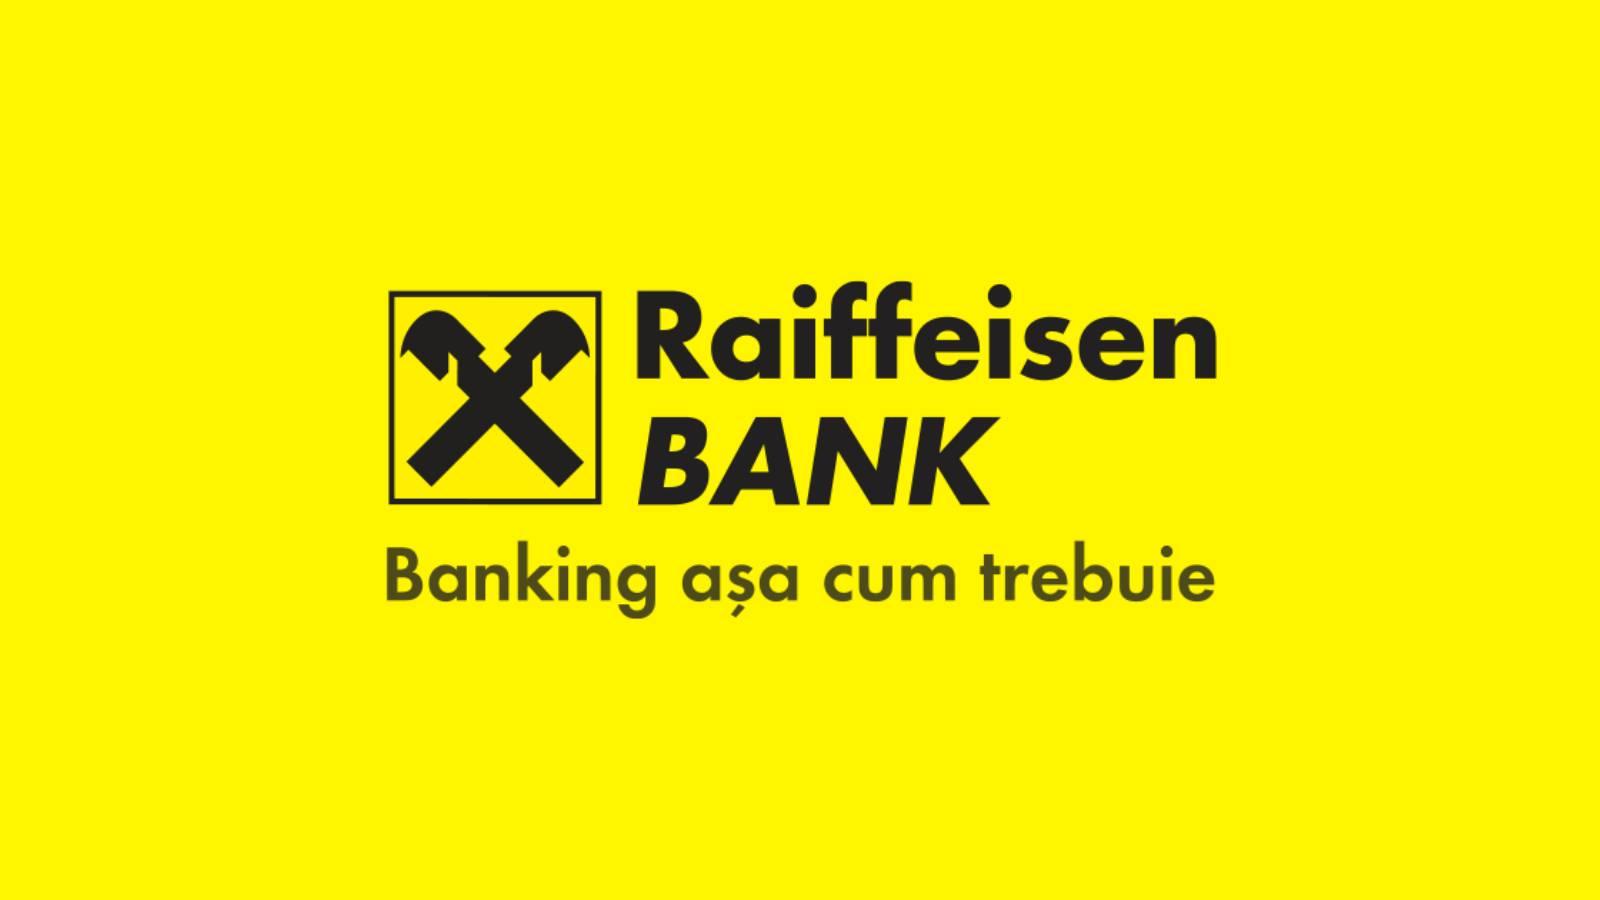 Raiffeisen Bank indisponibilitate